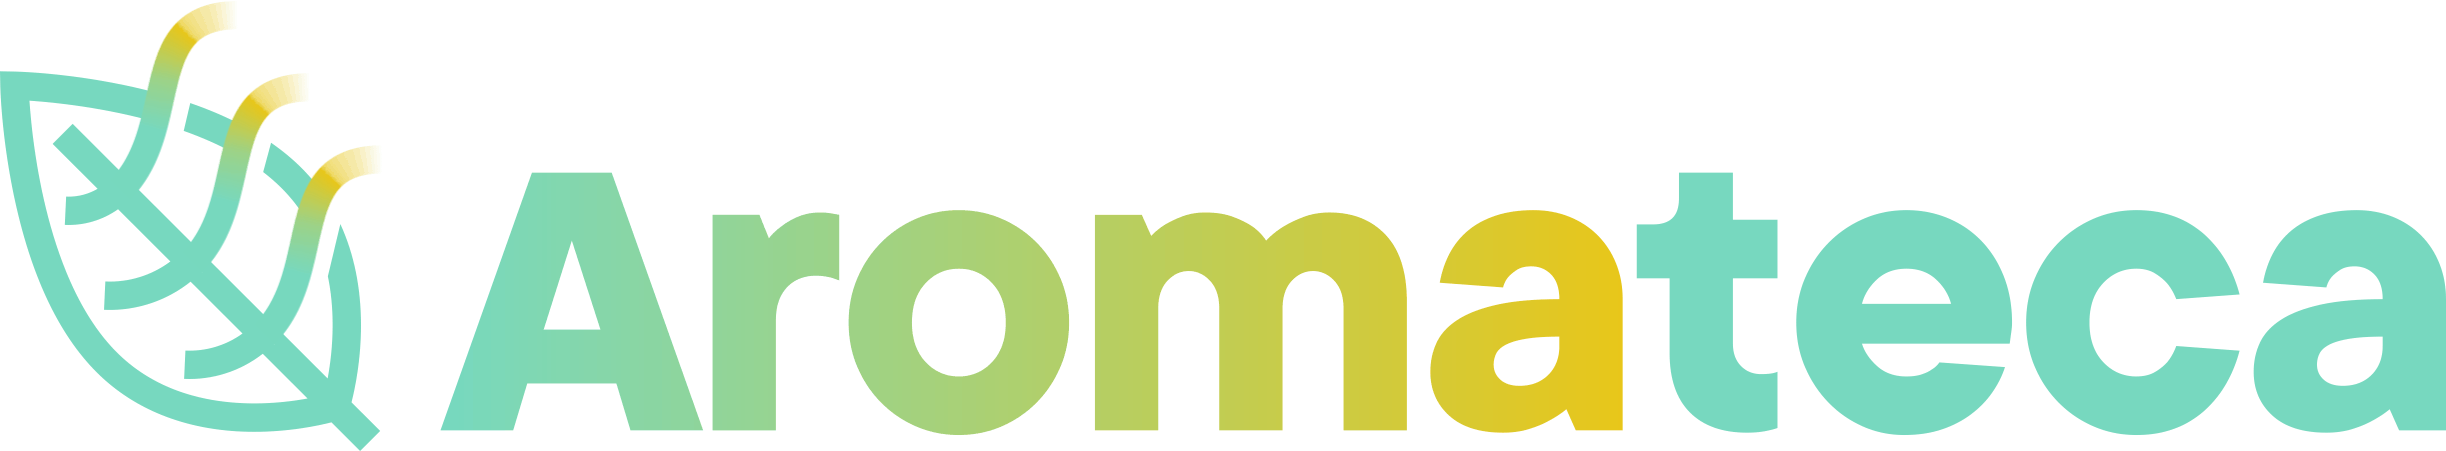 Blog – Aromateca